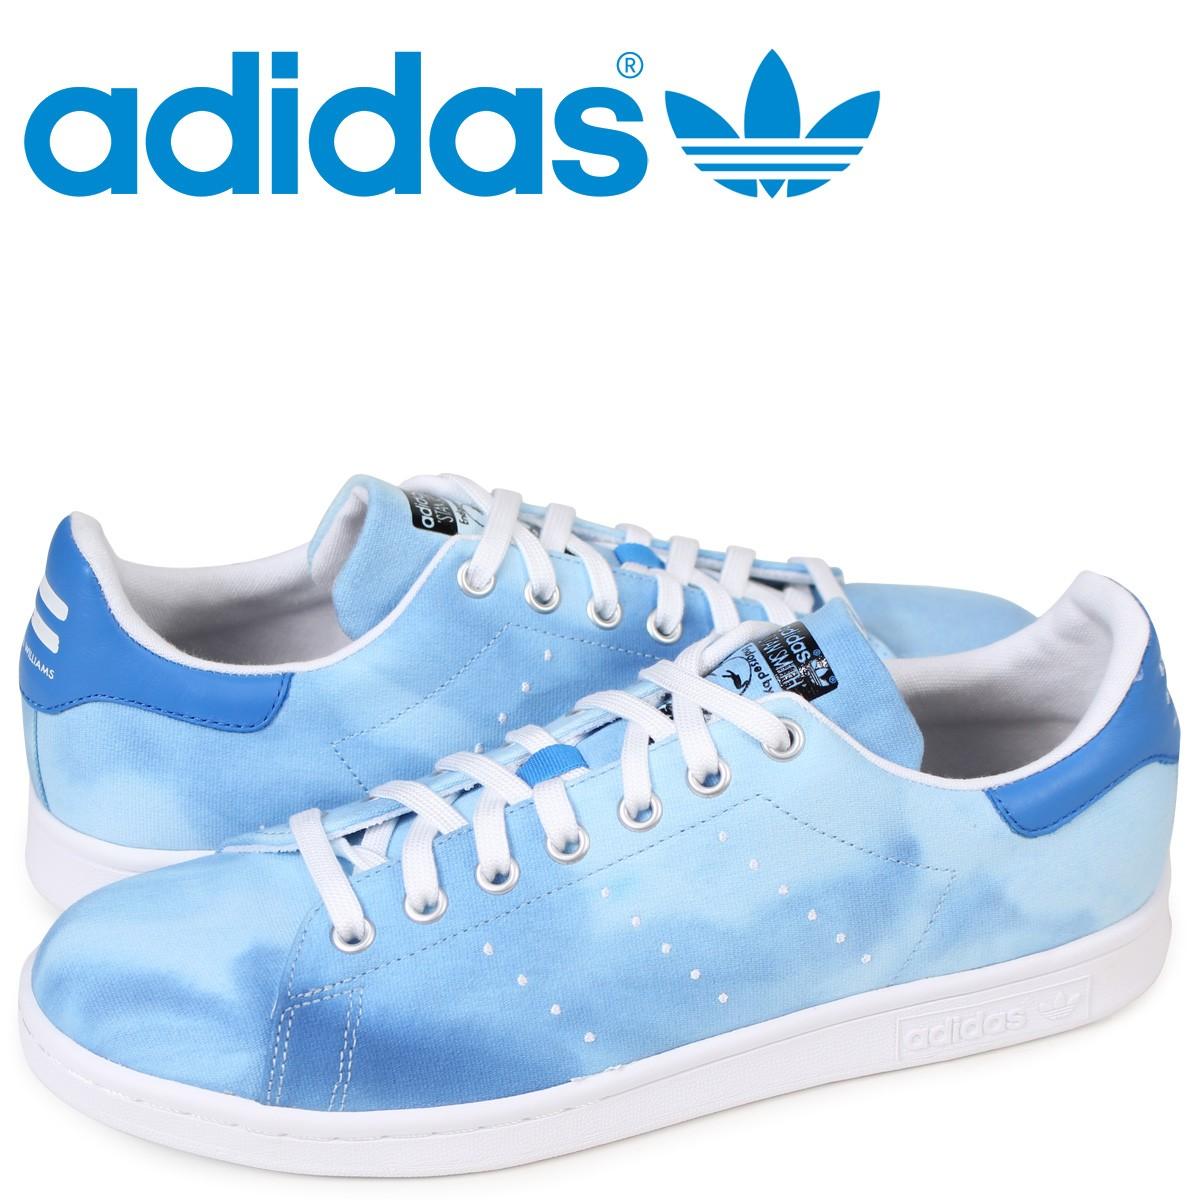 adidas Originals PW HU HOLI STAN SMITH アディダス スタンスミス スニーカー ファレルウィリアムス メンズ コラボ AC7045 ブルー オリジナルス [3/20 新入荷] [183]